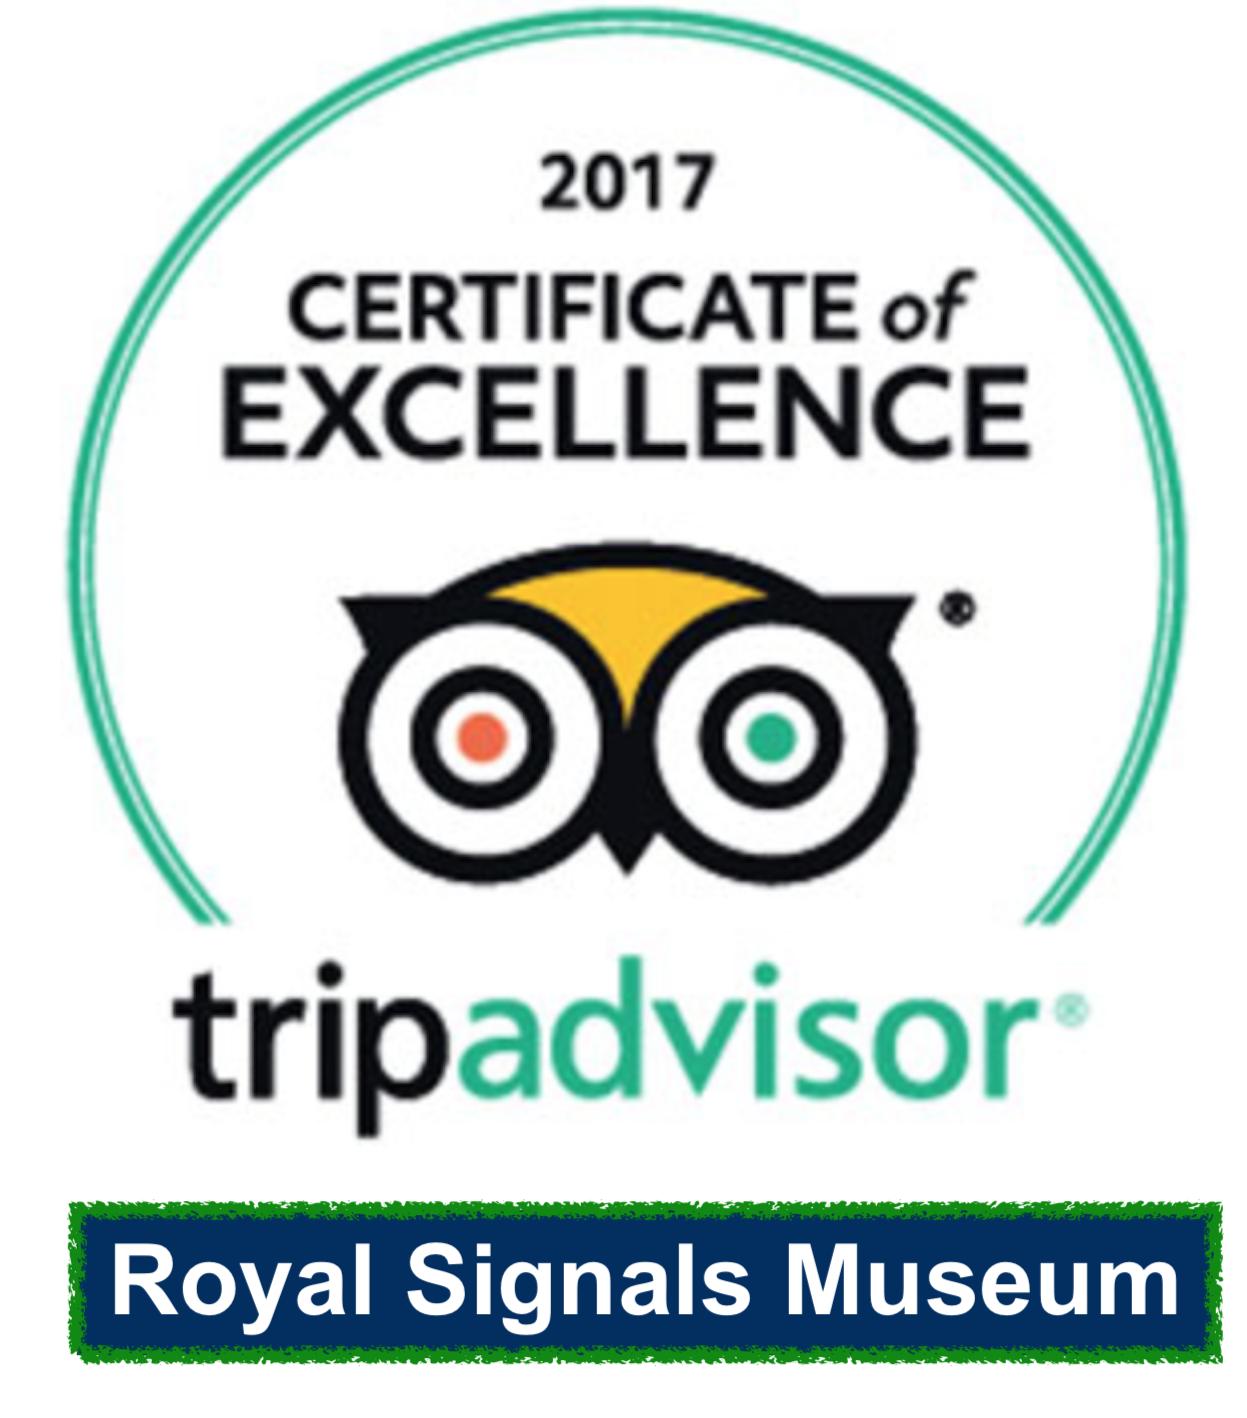 Royal Signals Museum